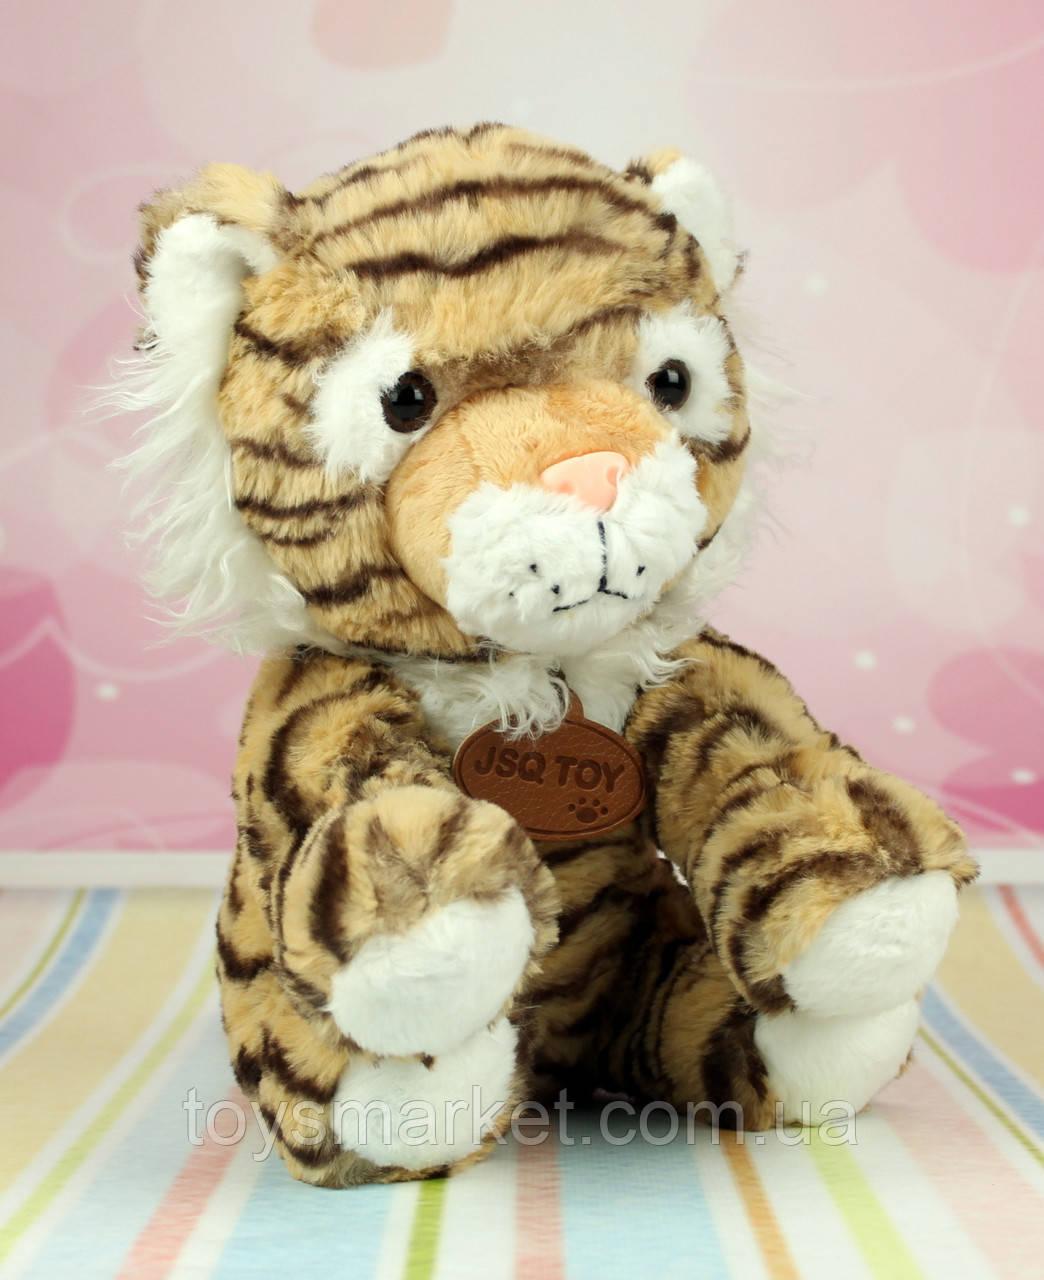 Мягкая игрушка Тигр, плюшевый тигр, игрушка тигренок, 30 см.